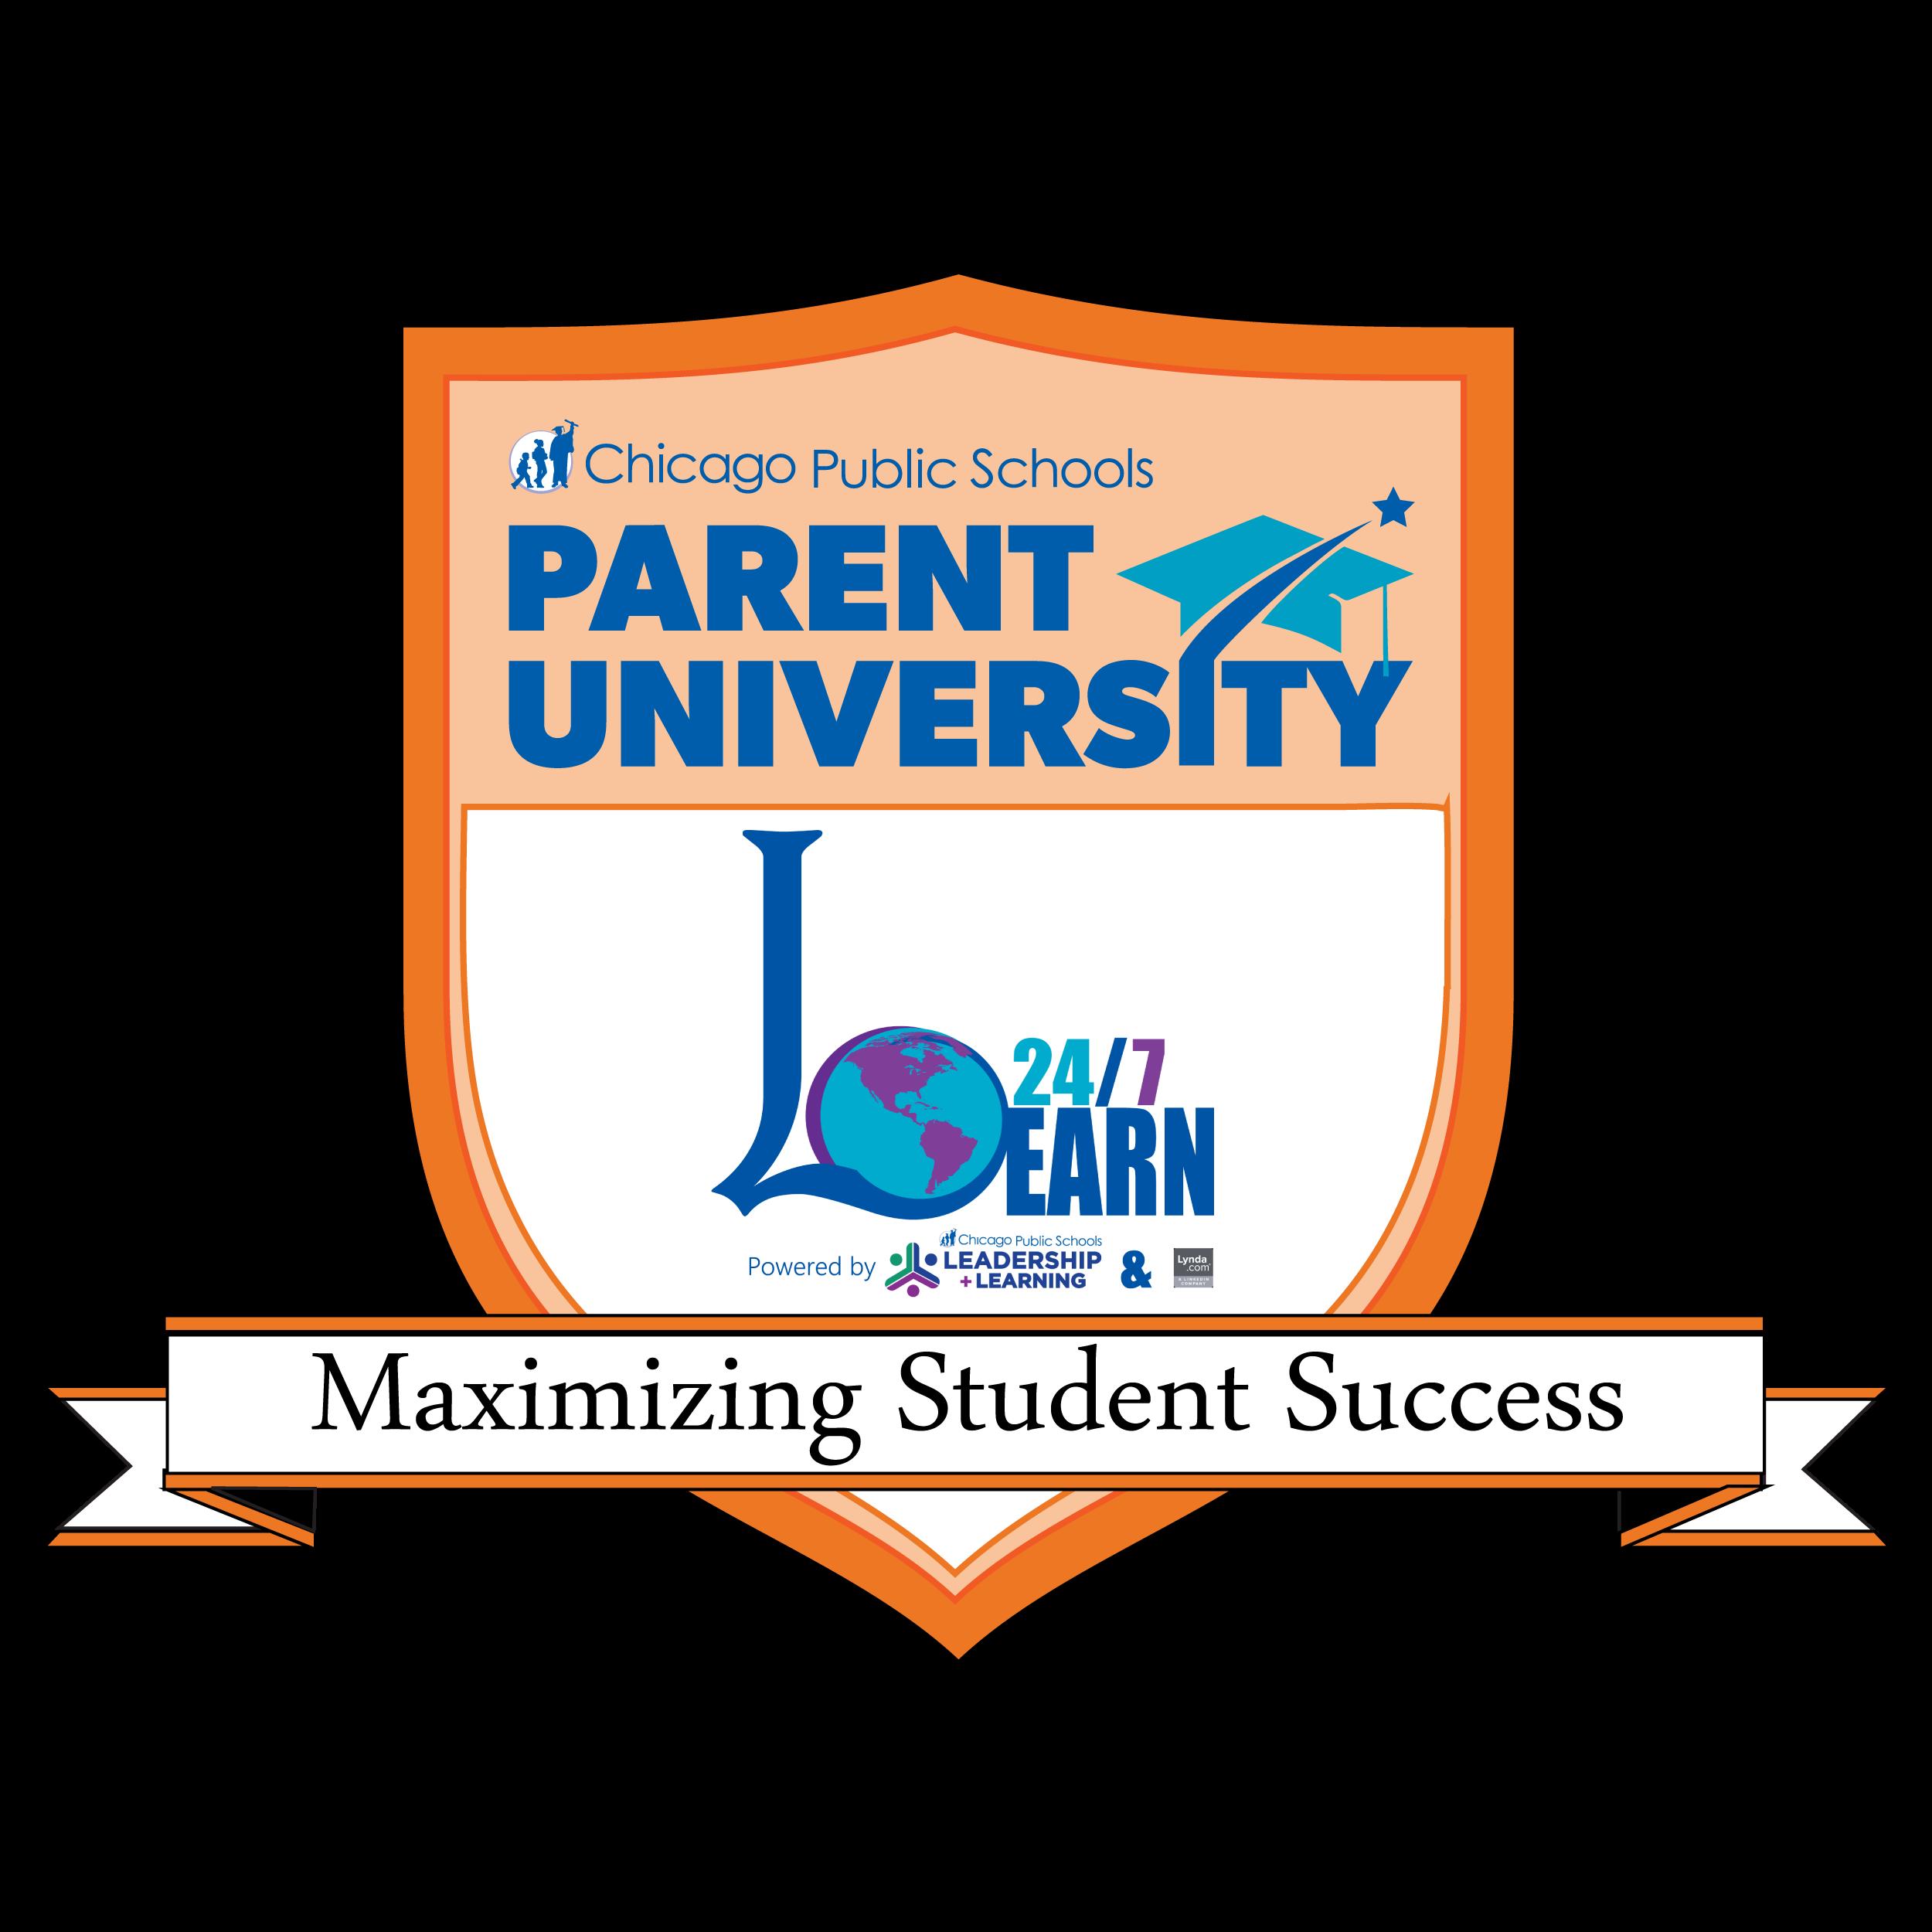 Maximizing Student Success